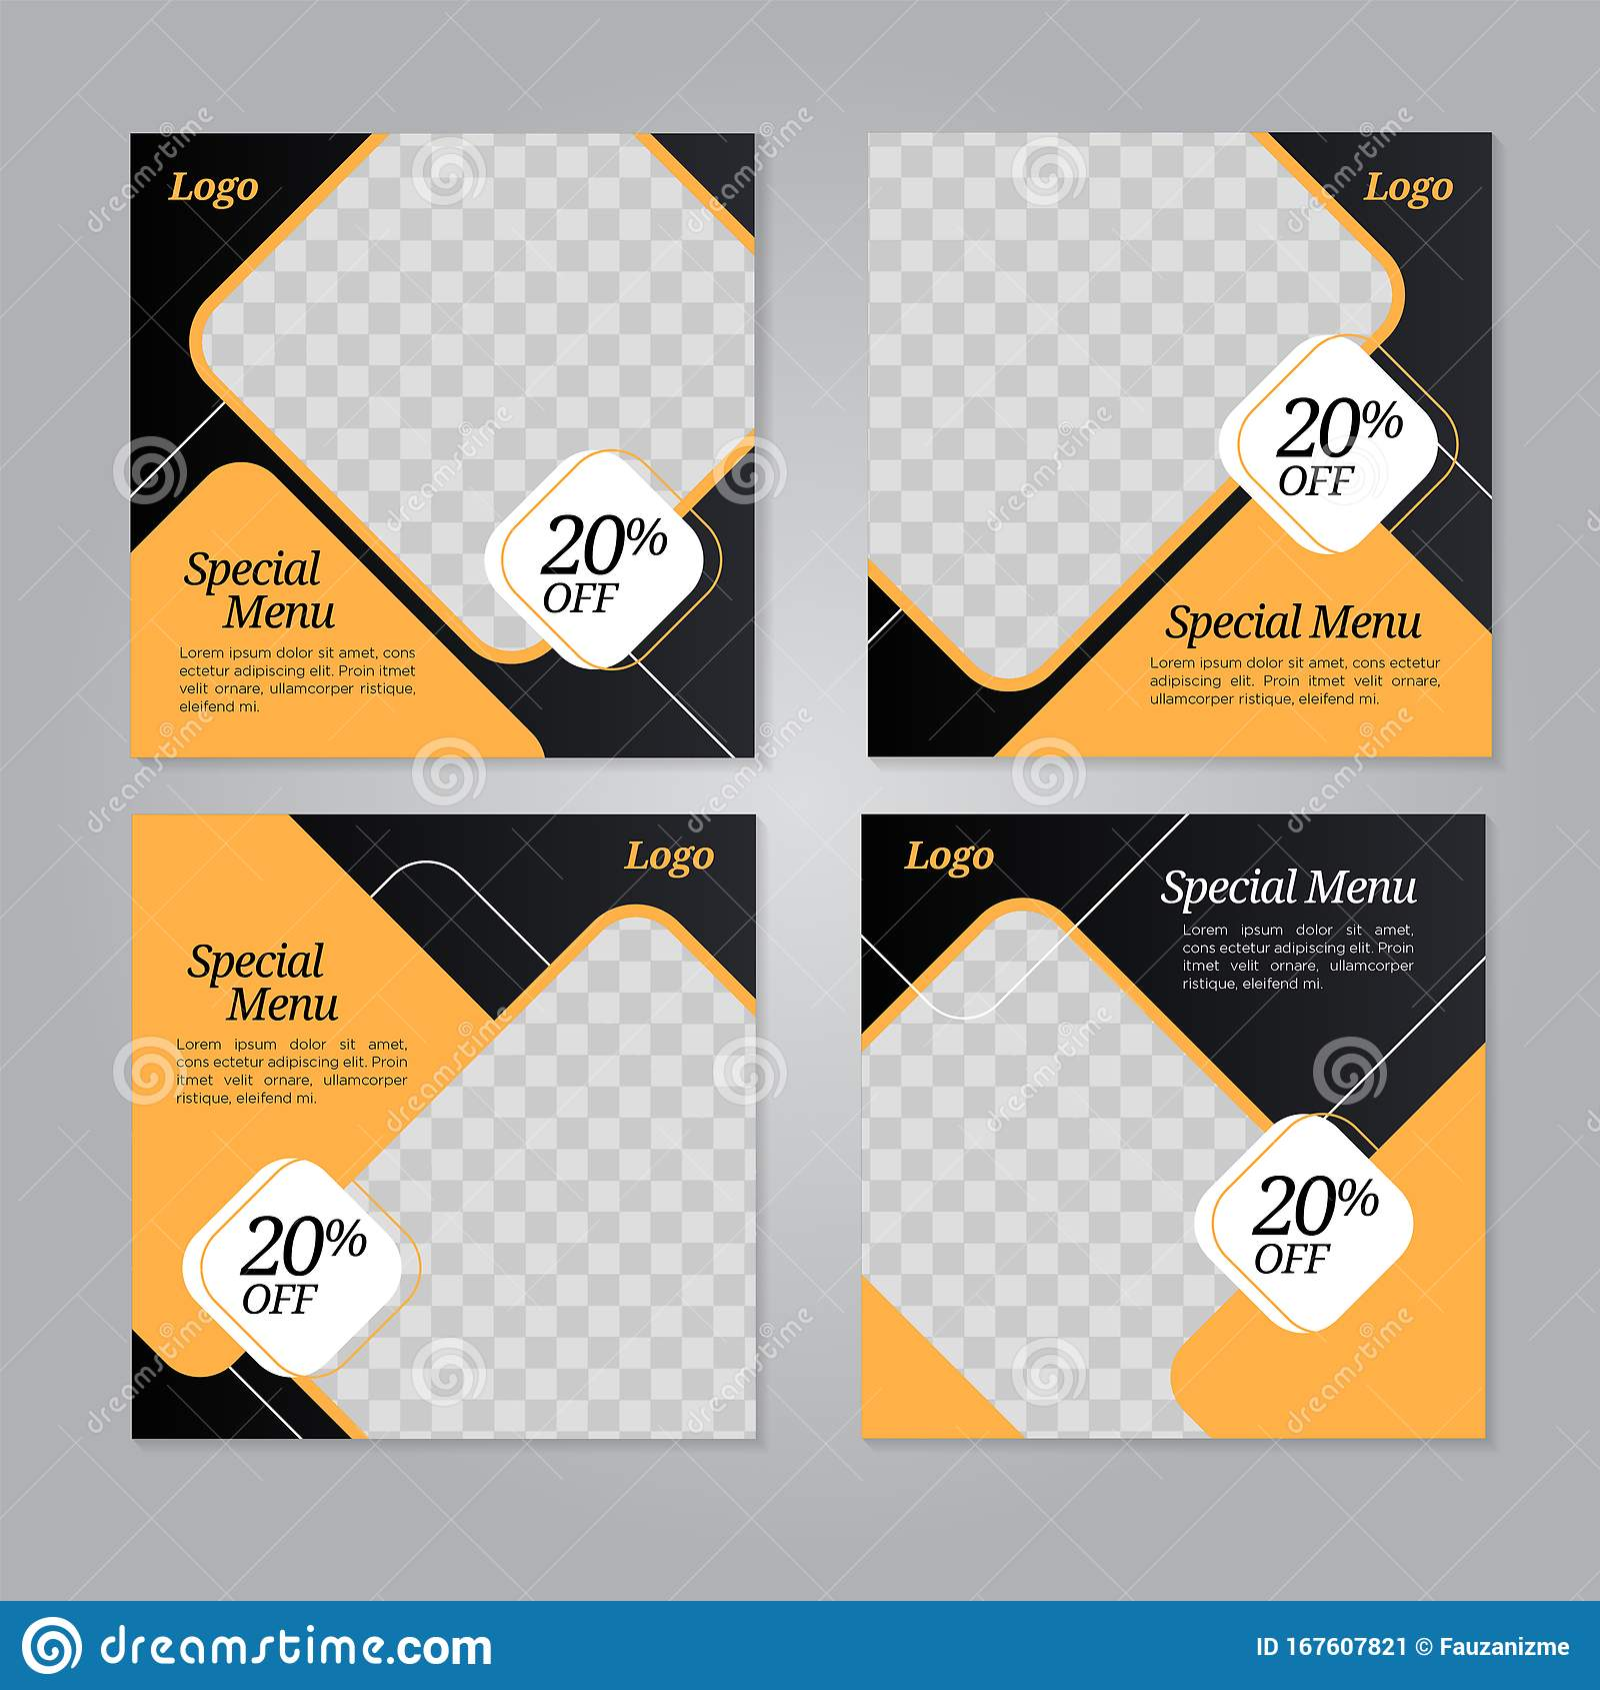 Restaurant Food Social Media Banner Post Design Template Stock Vector Illustration Of Post Social 167607821